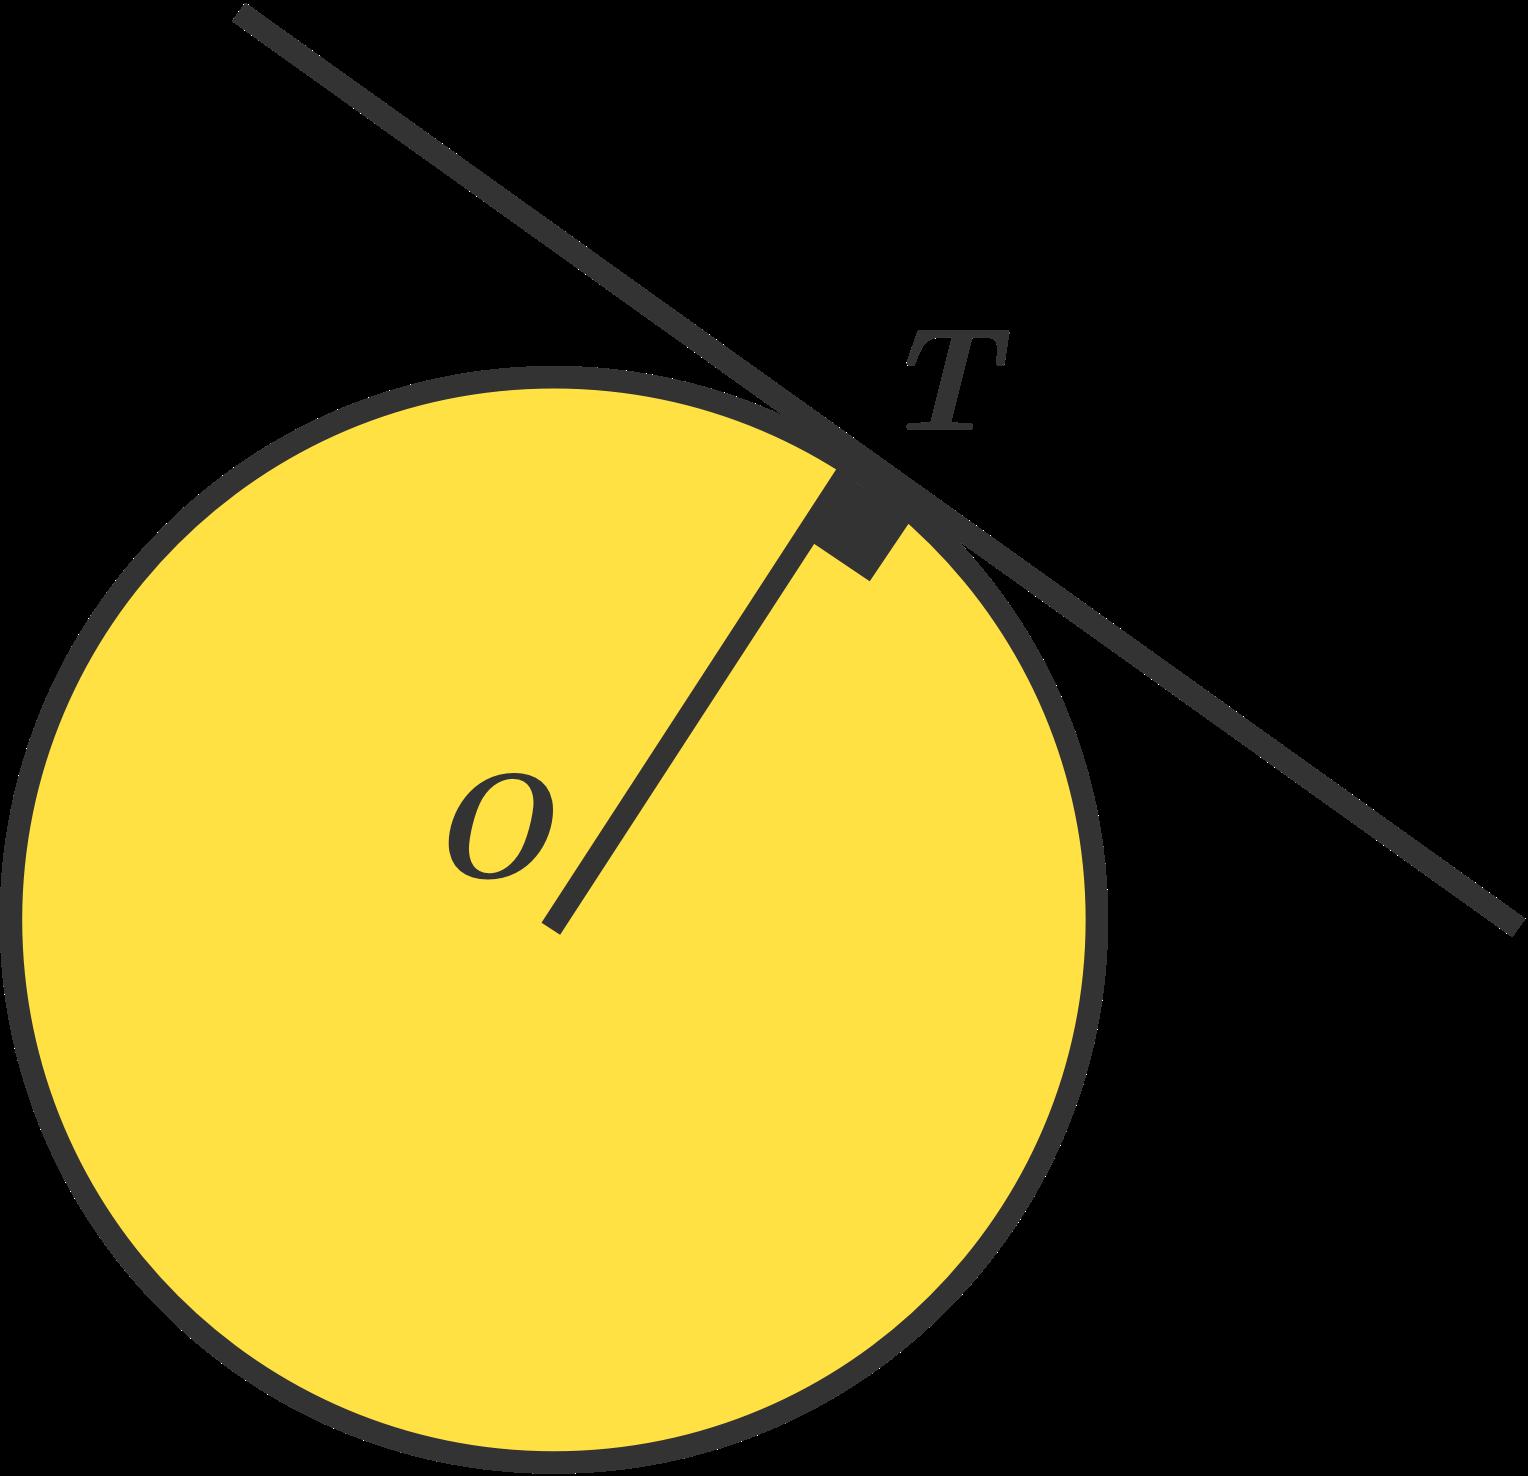 Radius Geometry Definition